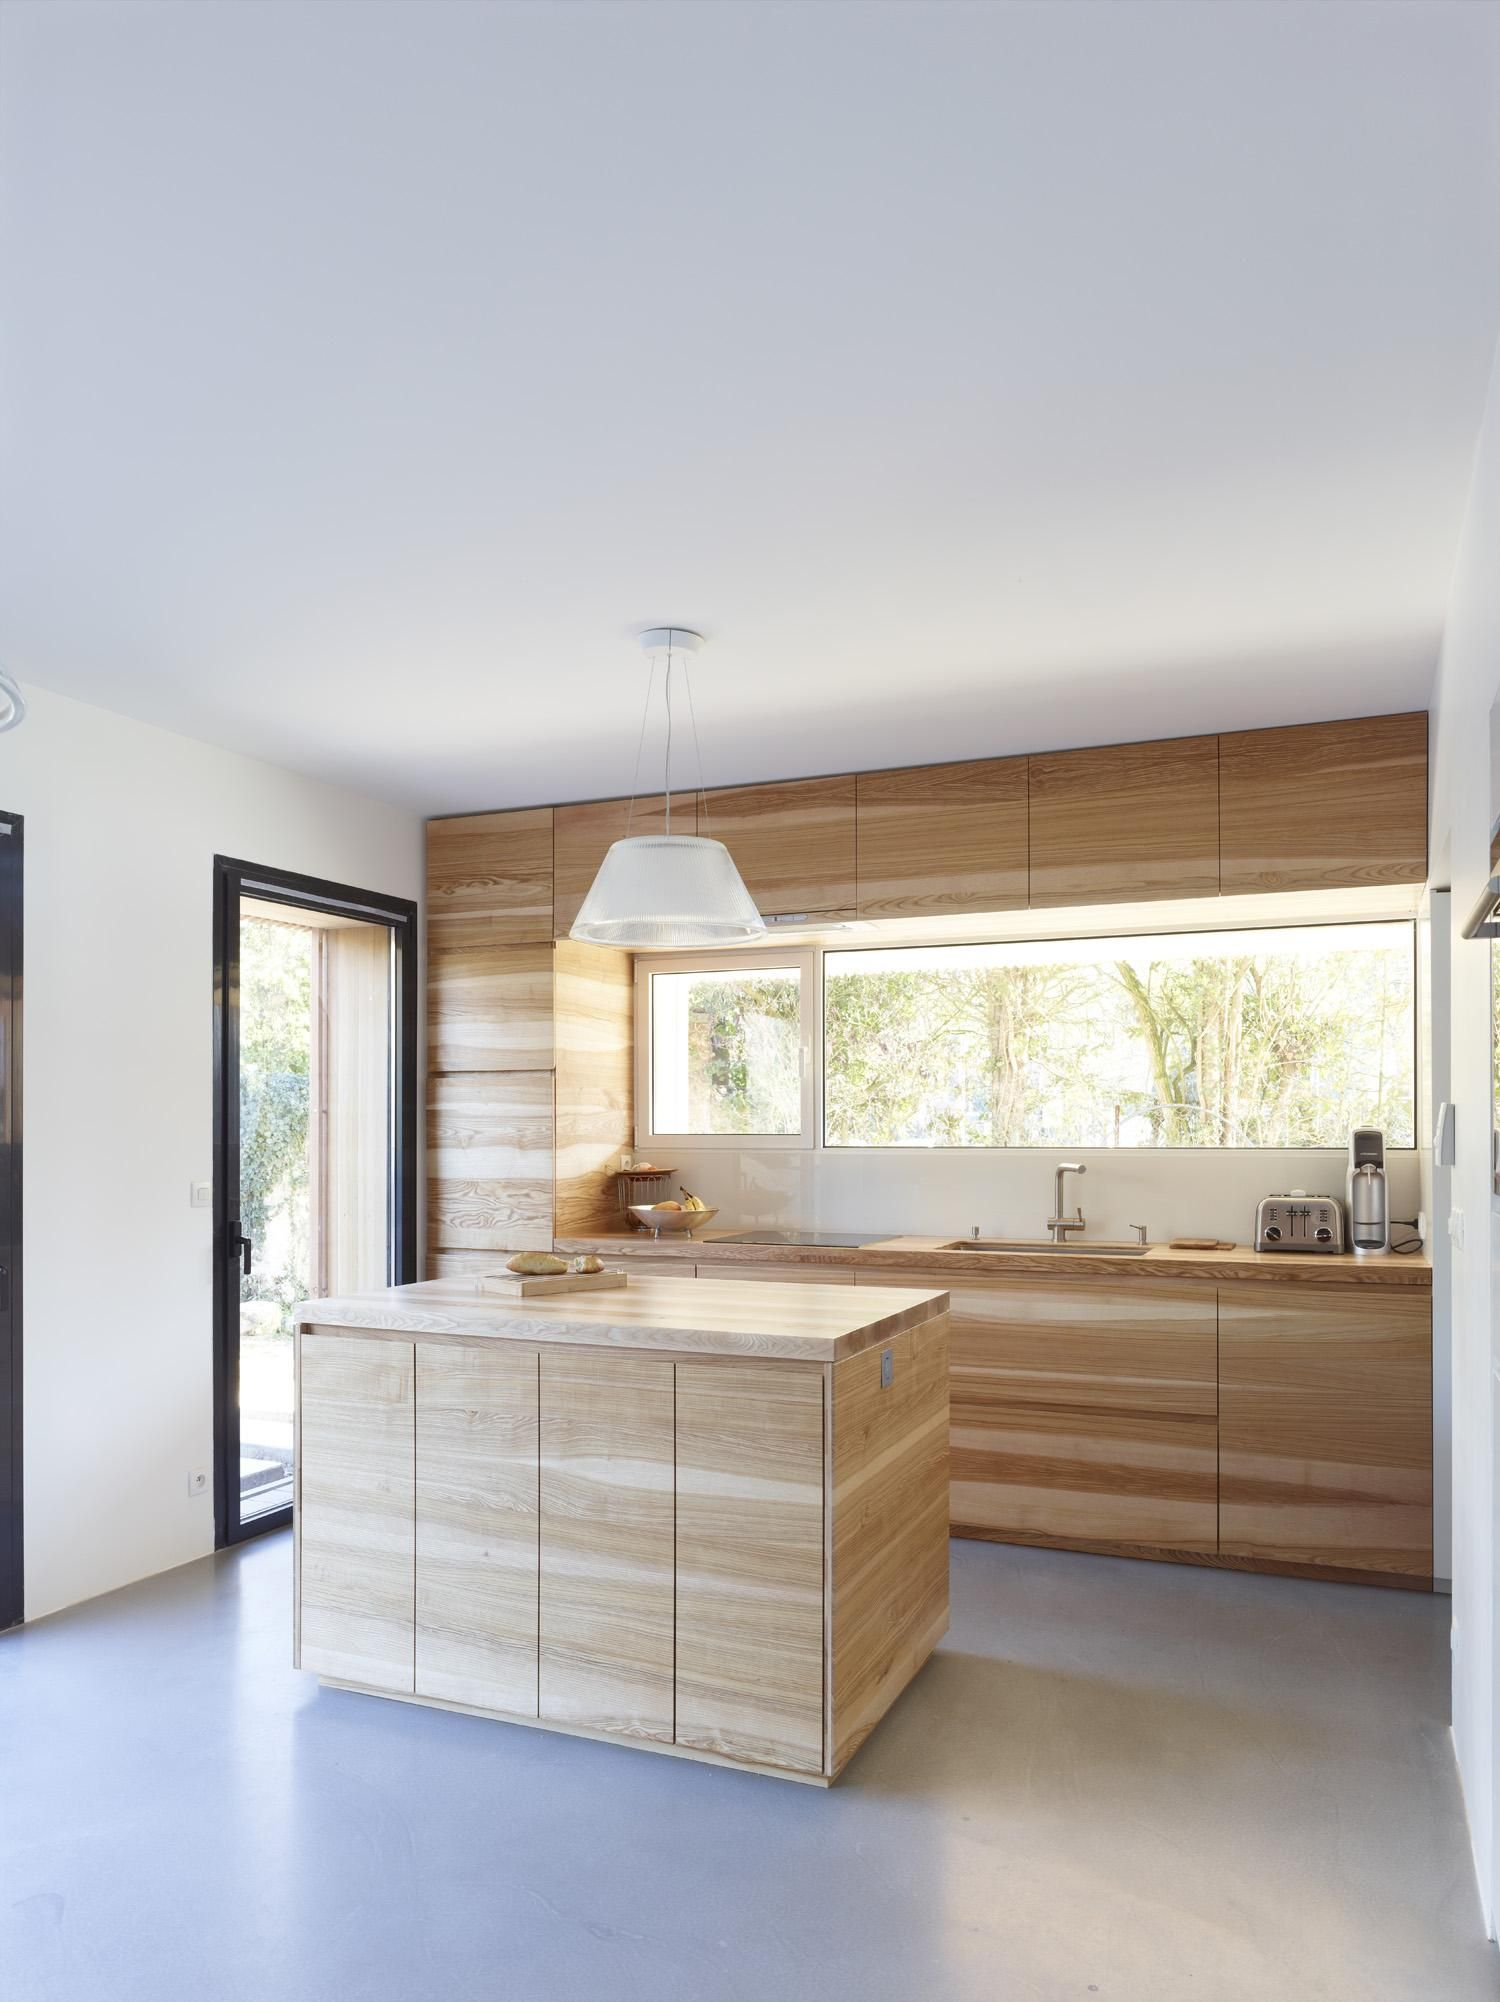 Stéphane Chalmeau | Kitchens We Want to Cook In | Pinterest | Küche ...